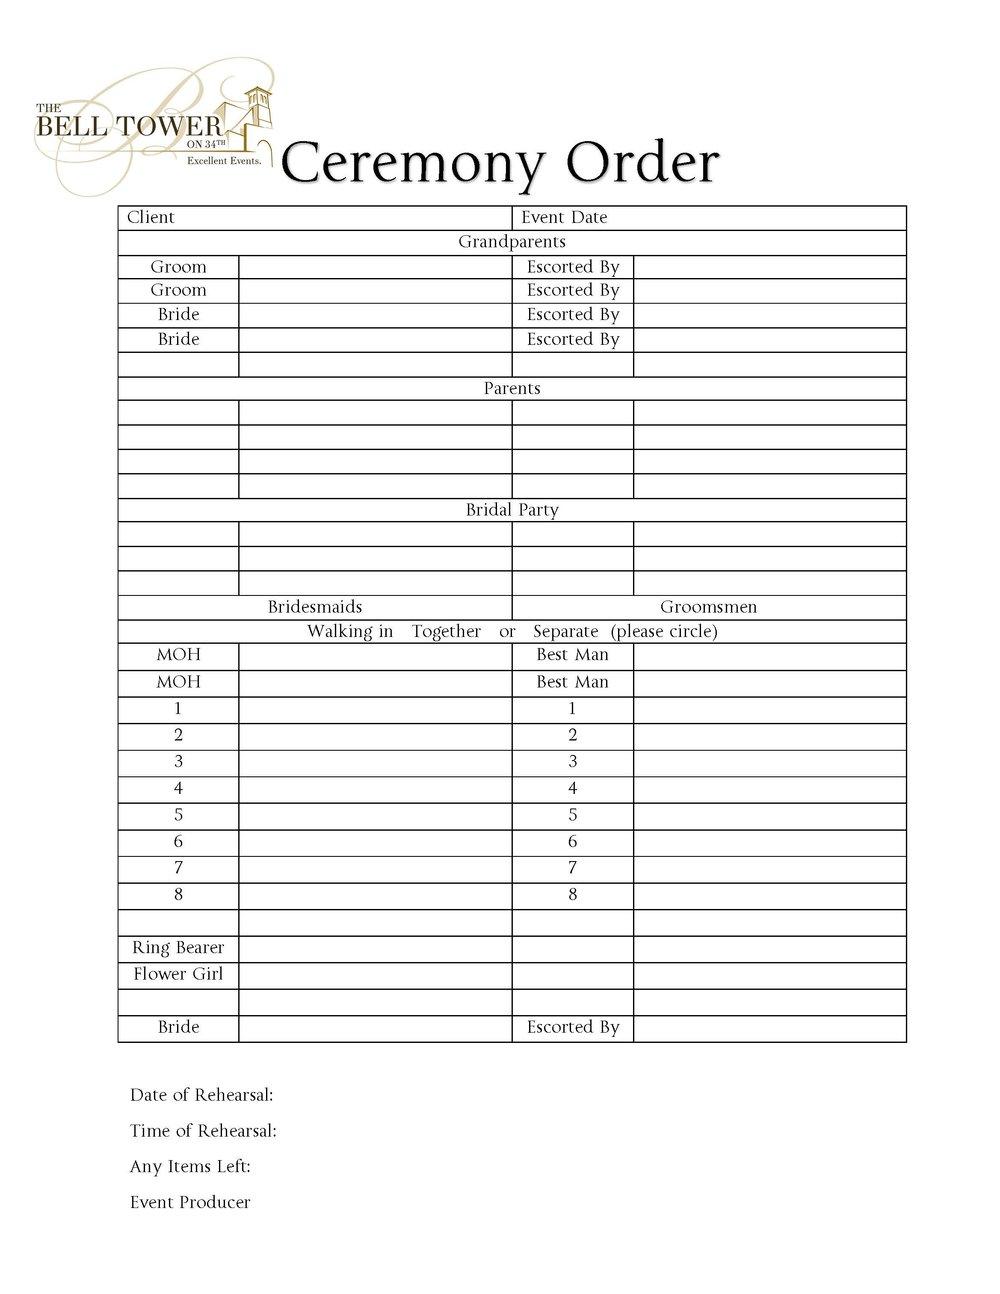 Ceremony Order 11.13.15.jpg